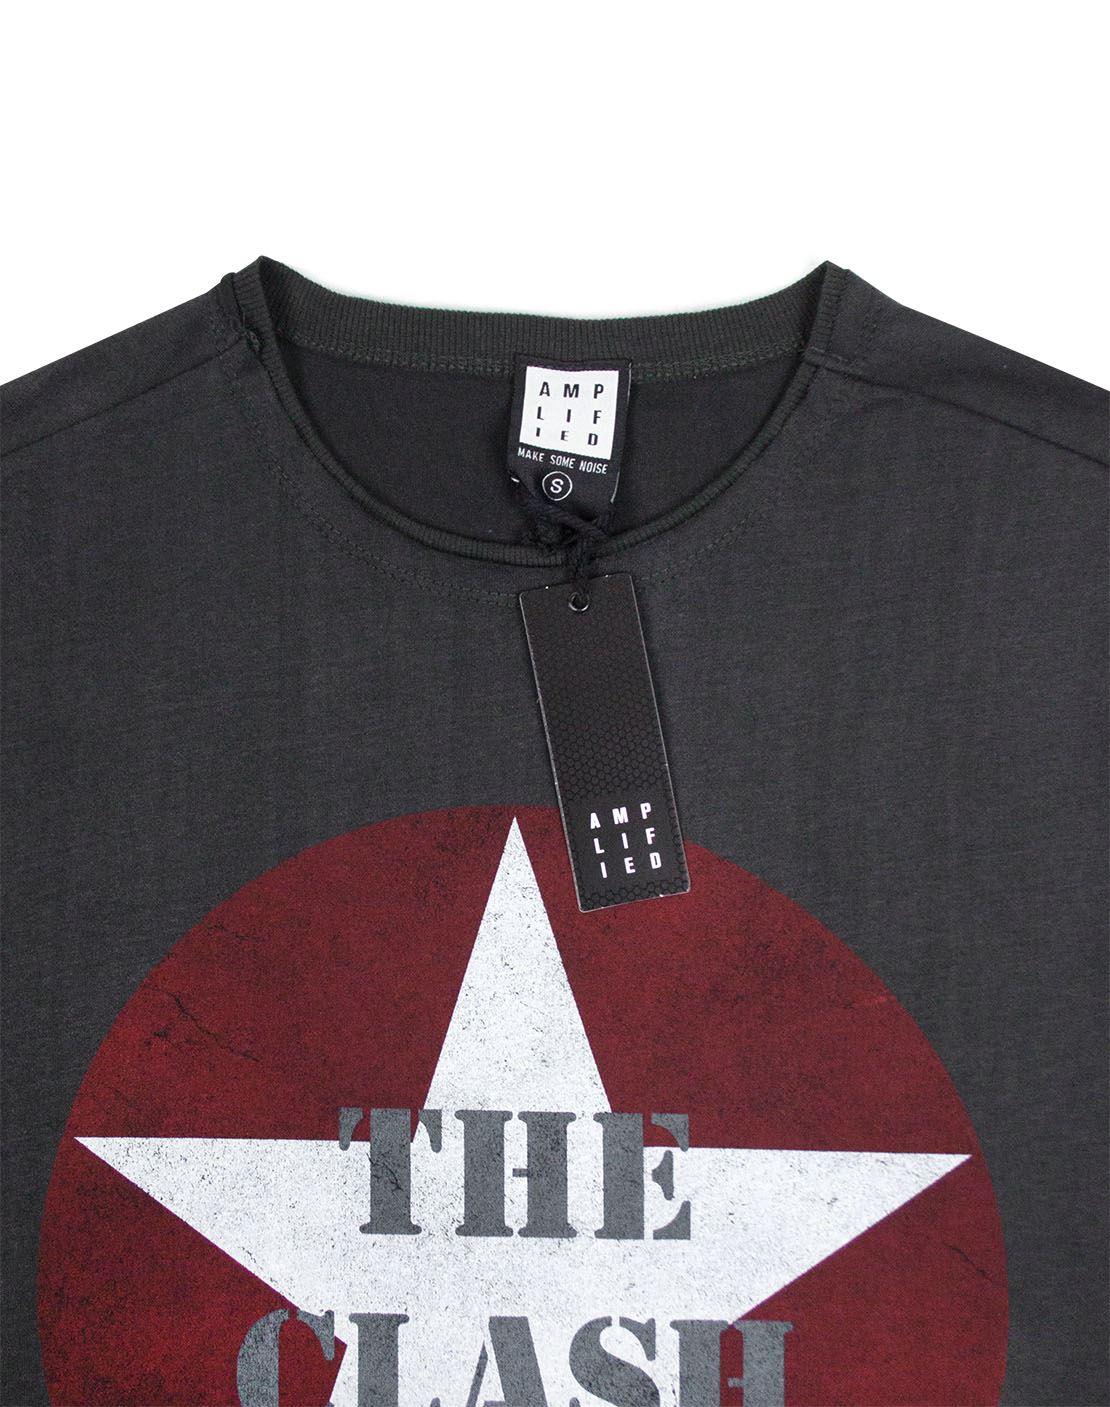 Amplified Metallica Logo Unisexe Charbon T-Shirt